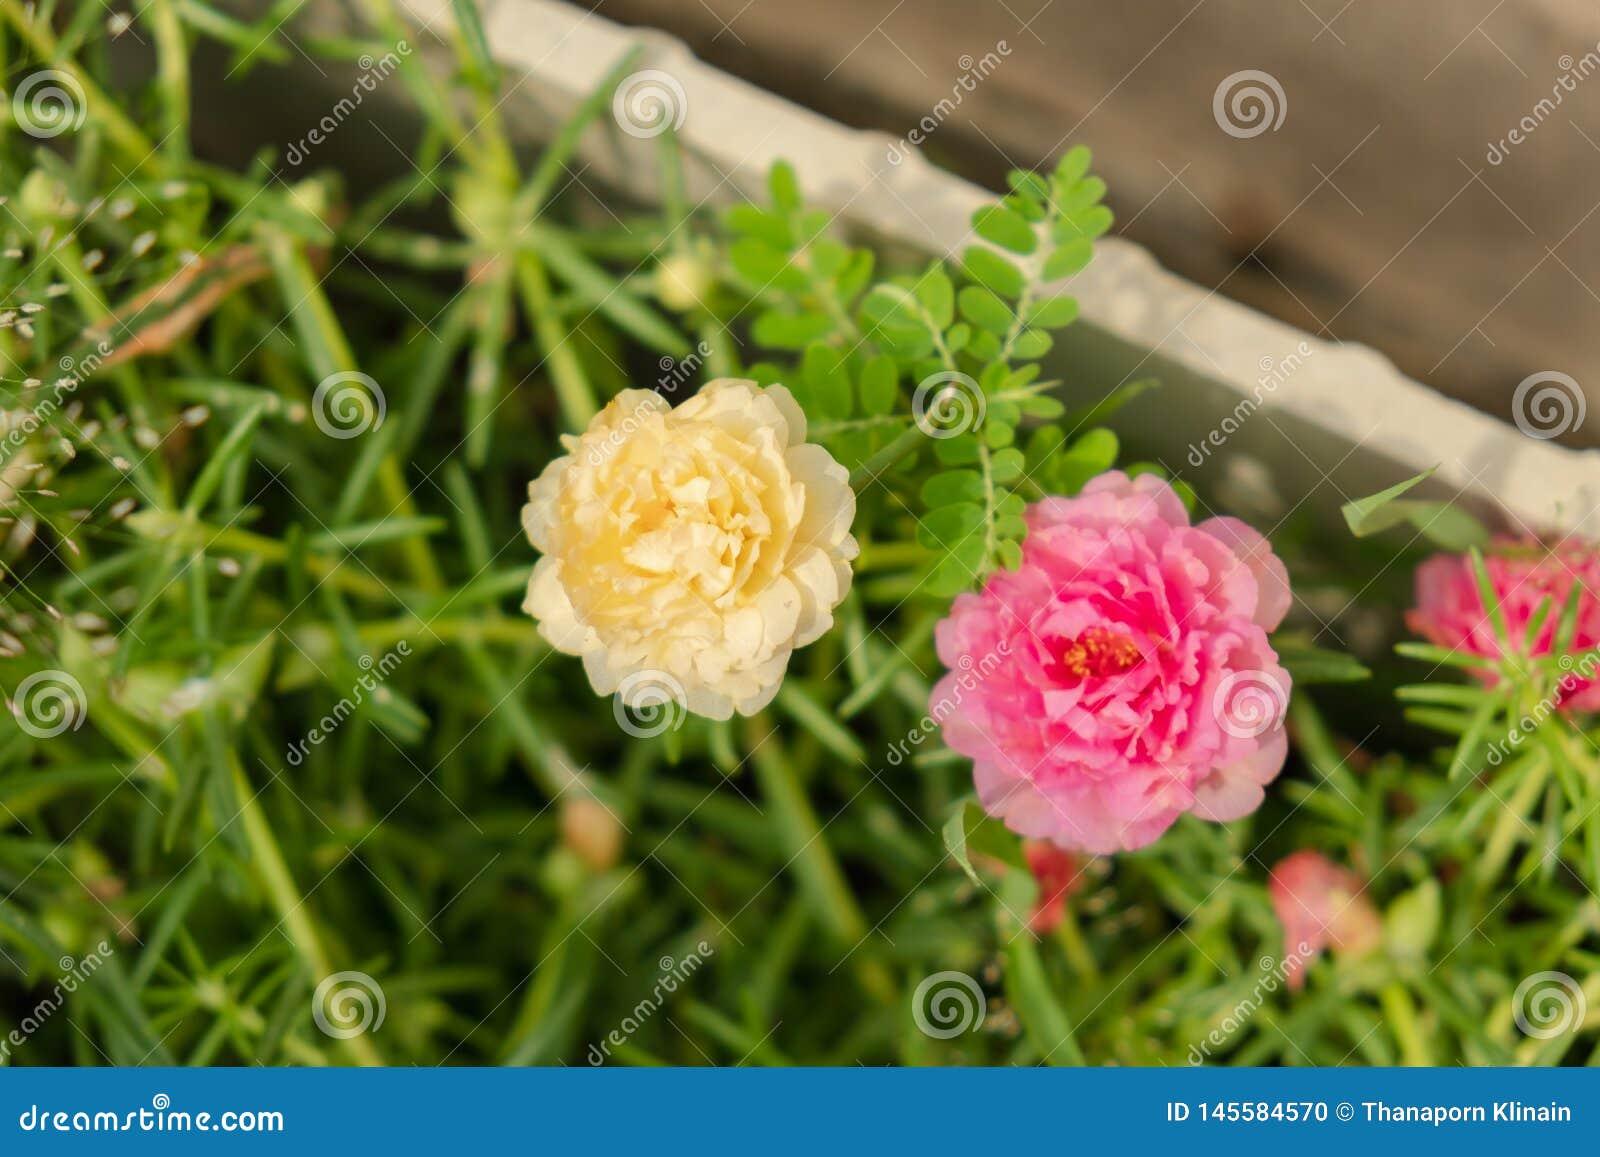 Sluit omhoog gele en roze portulacabloem